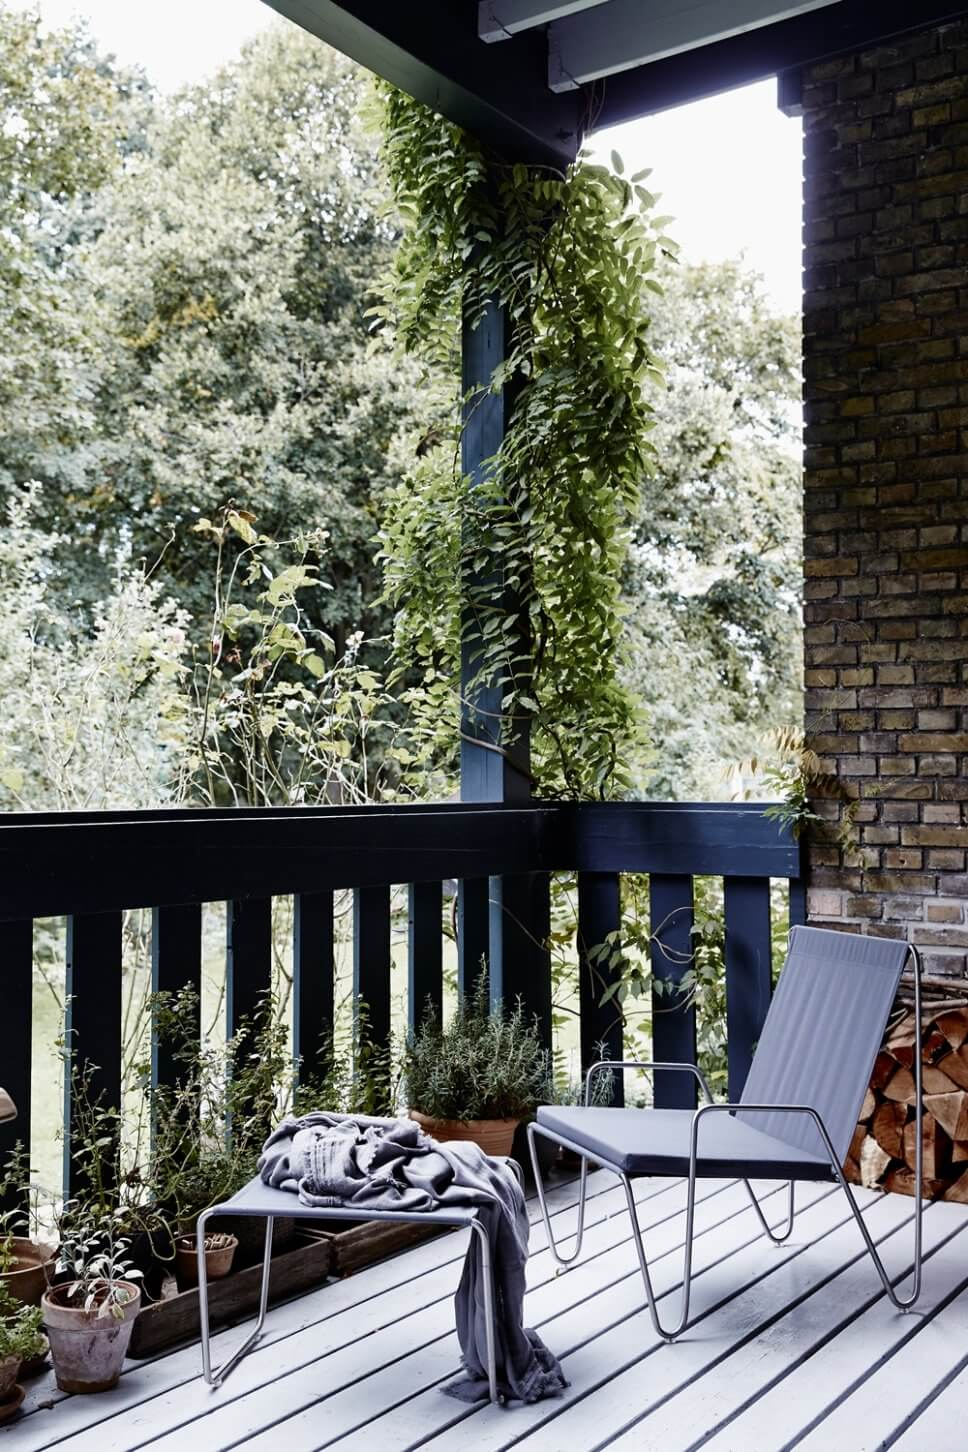 Moderner Gartensessel auf Veranda